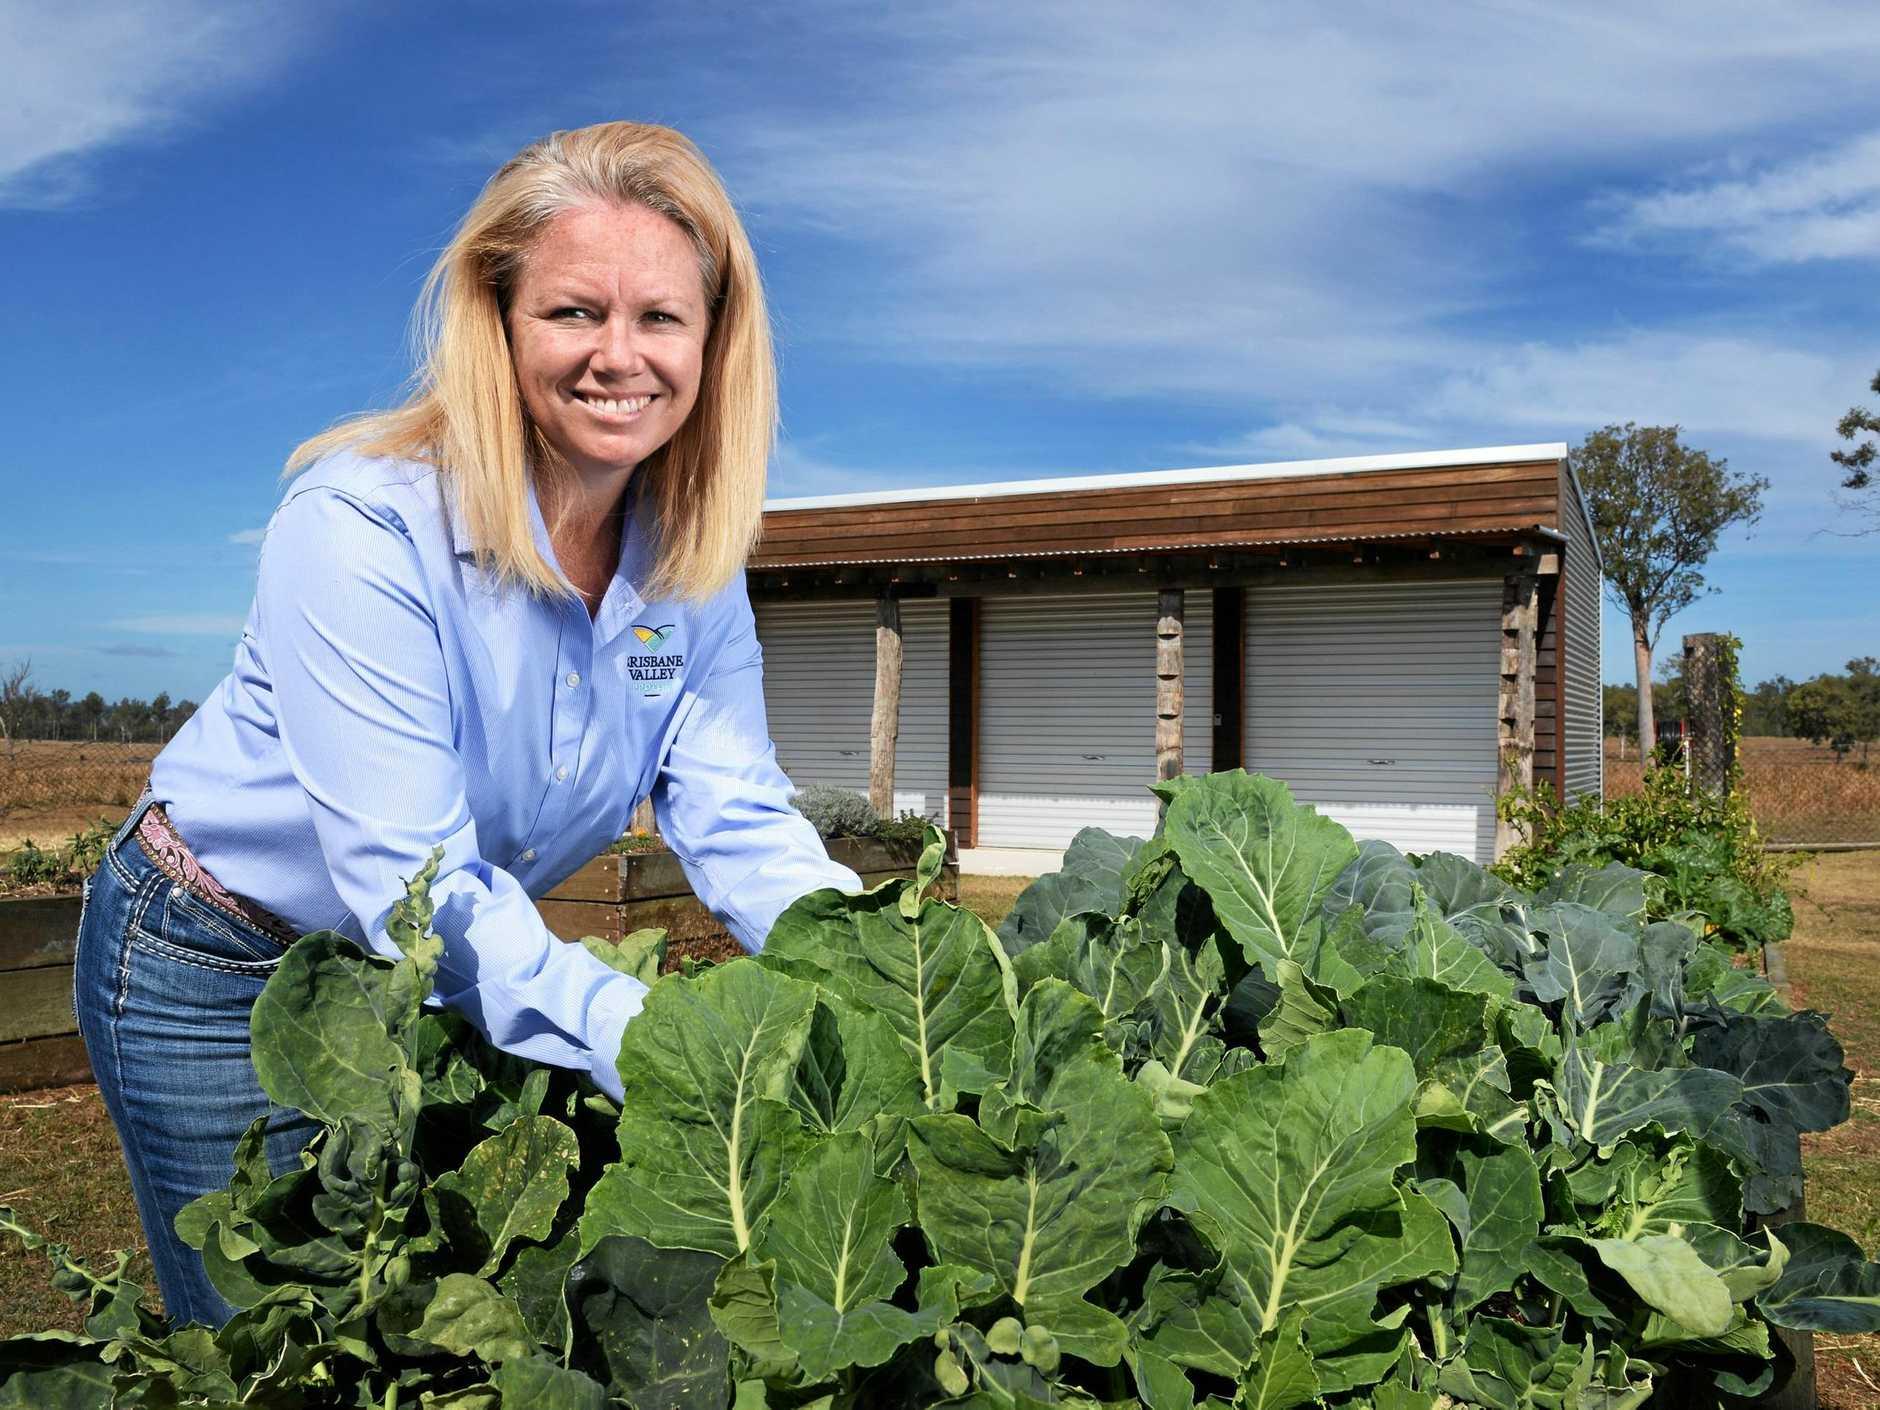 HAND PICKED: Dallas Rumbelow tends to the community garden at Brisbane Valley Protein Precinct.